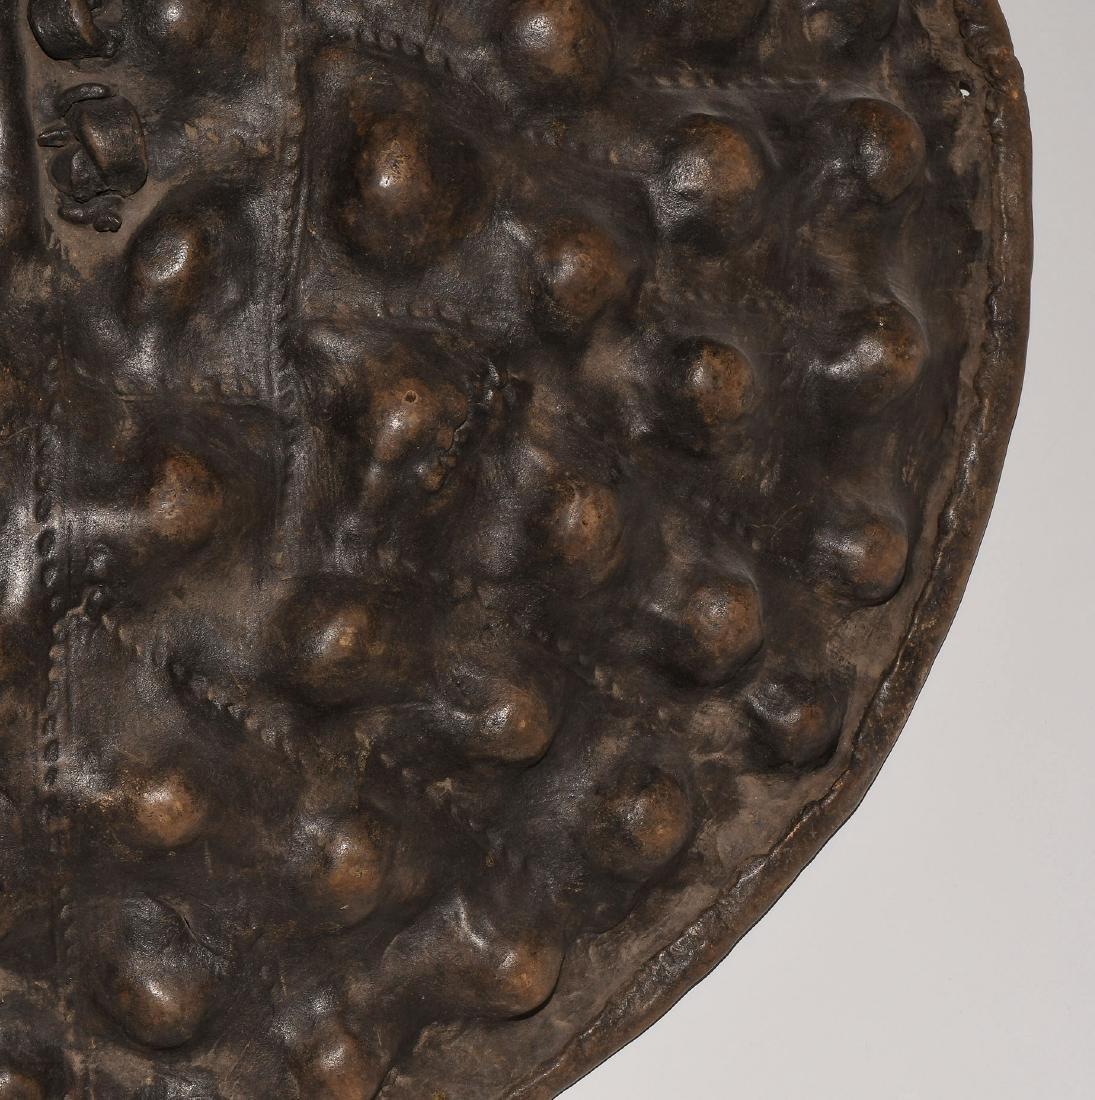 Schild Amarro. Äthiopien. Tierhaut, dunkelbraune - 4